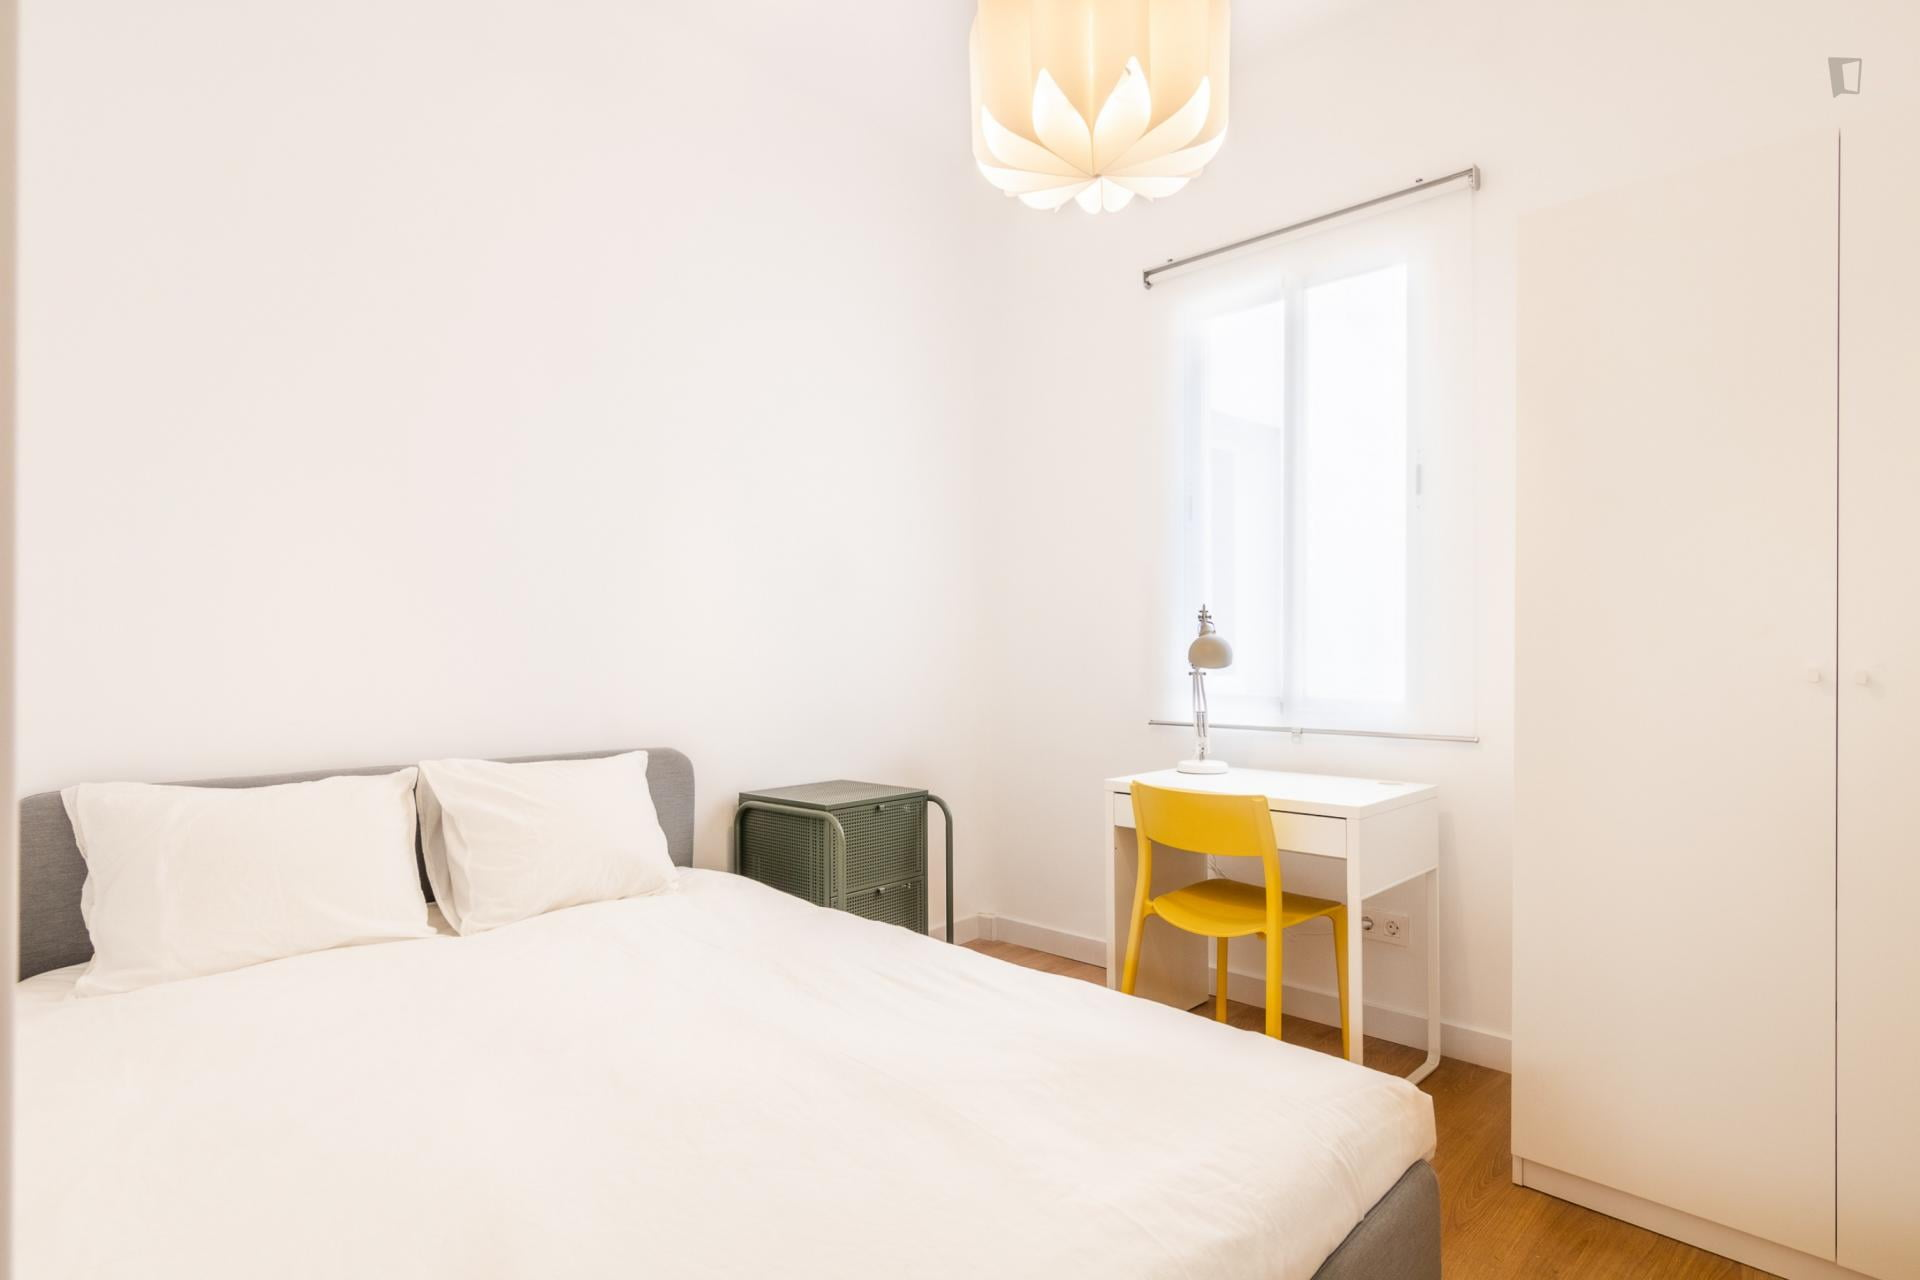 Latina - 4 bedroom apartment in Madrid